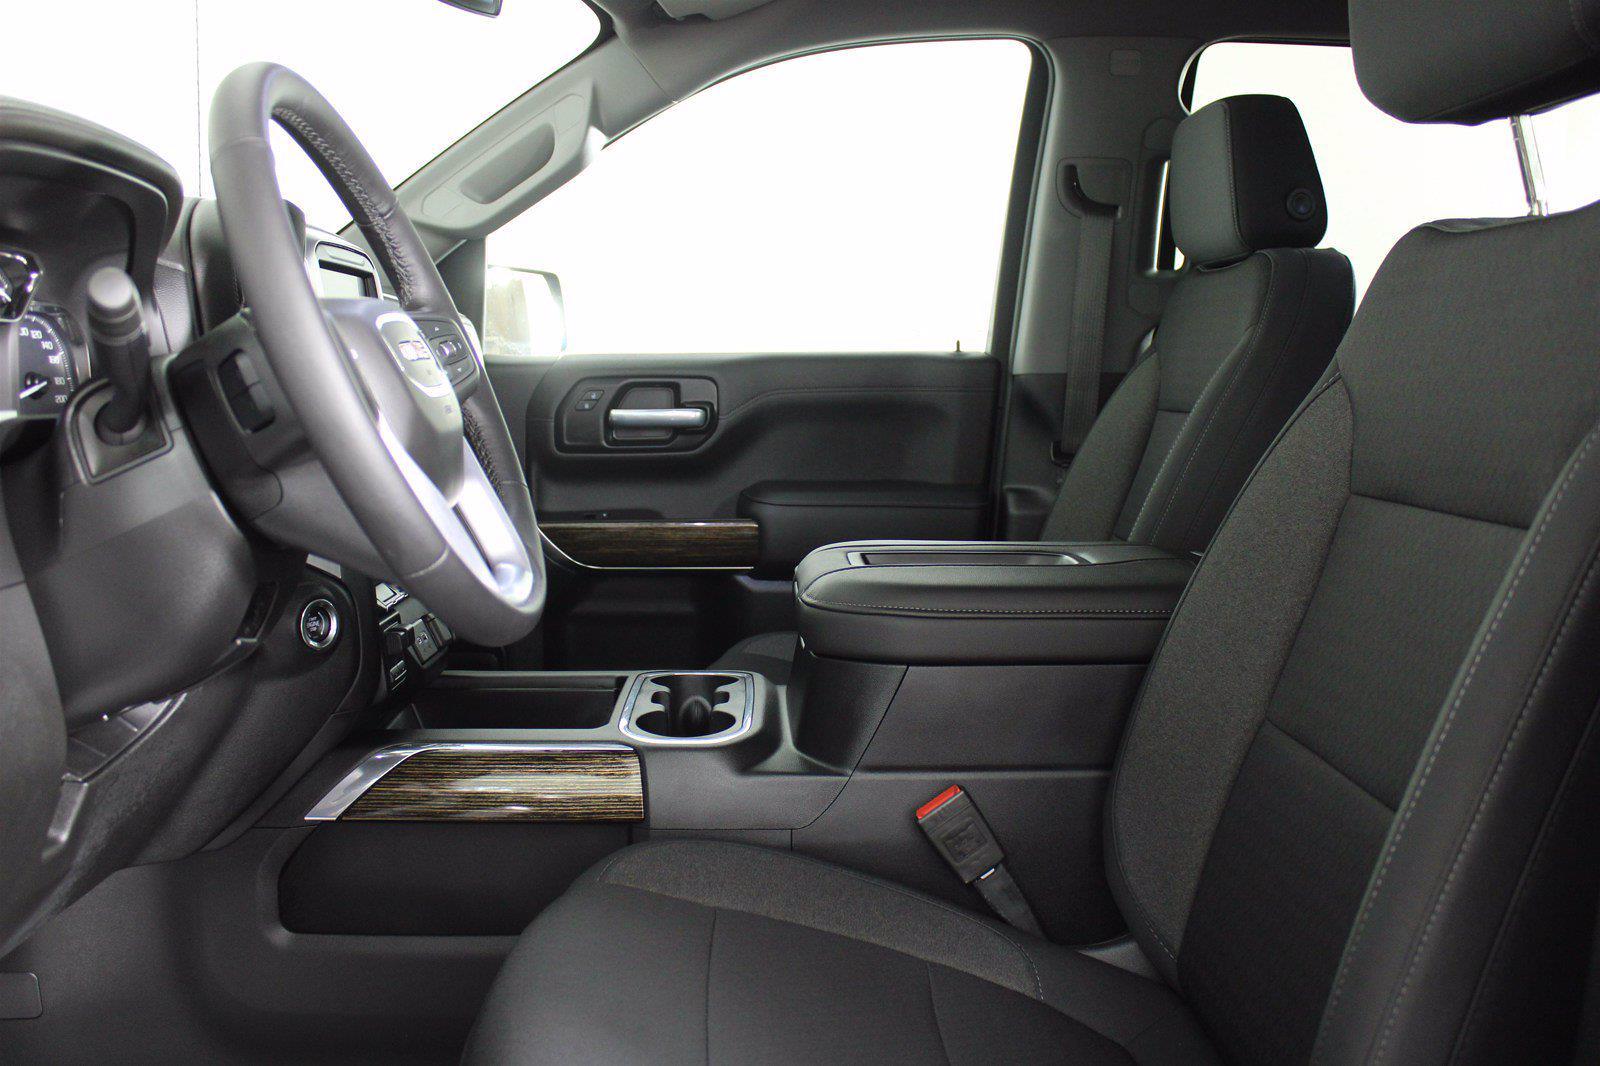 2020 GMC Sierra 1500 Crew Cab 4x4, Pickup #DAF0533 - photo 4